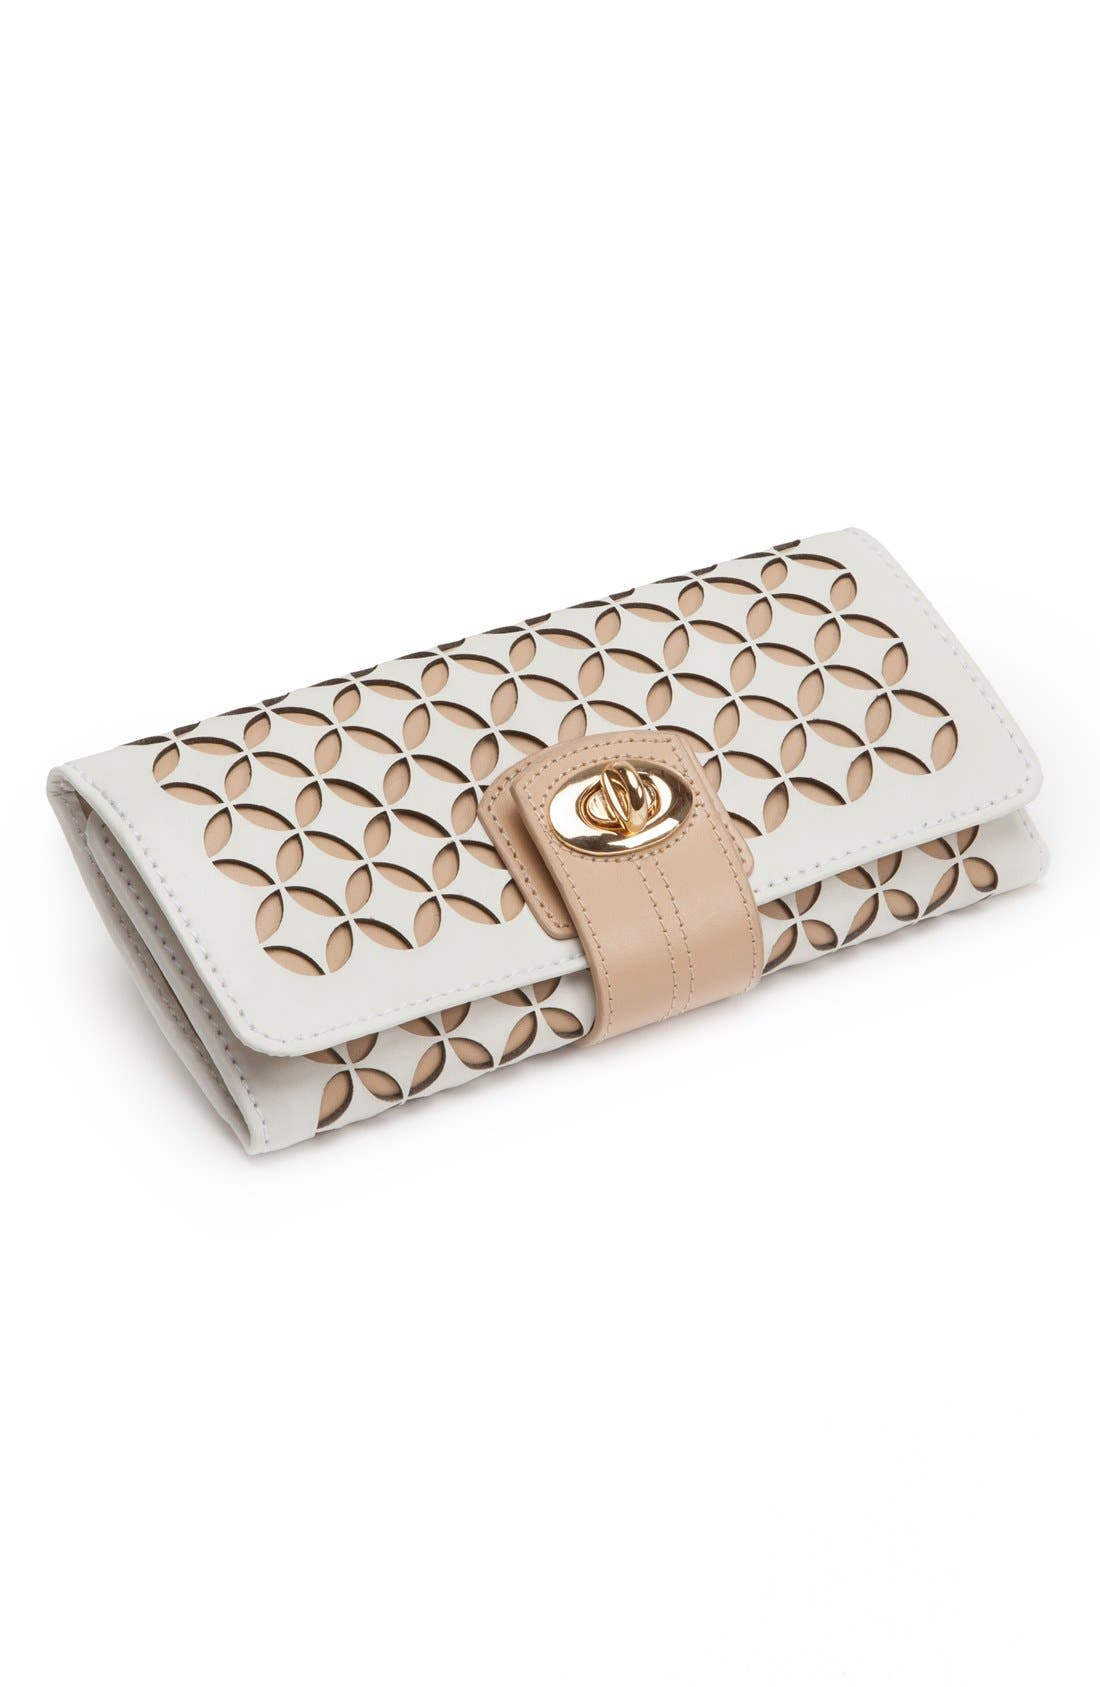 Wolf 'Chloe' Jewelry Roll